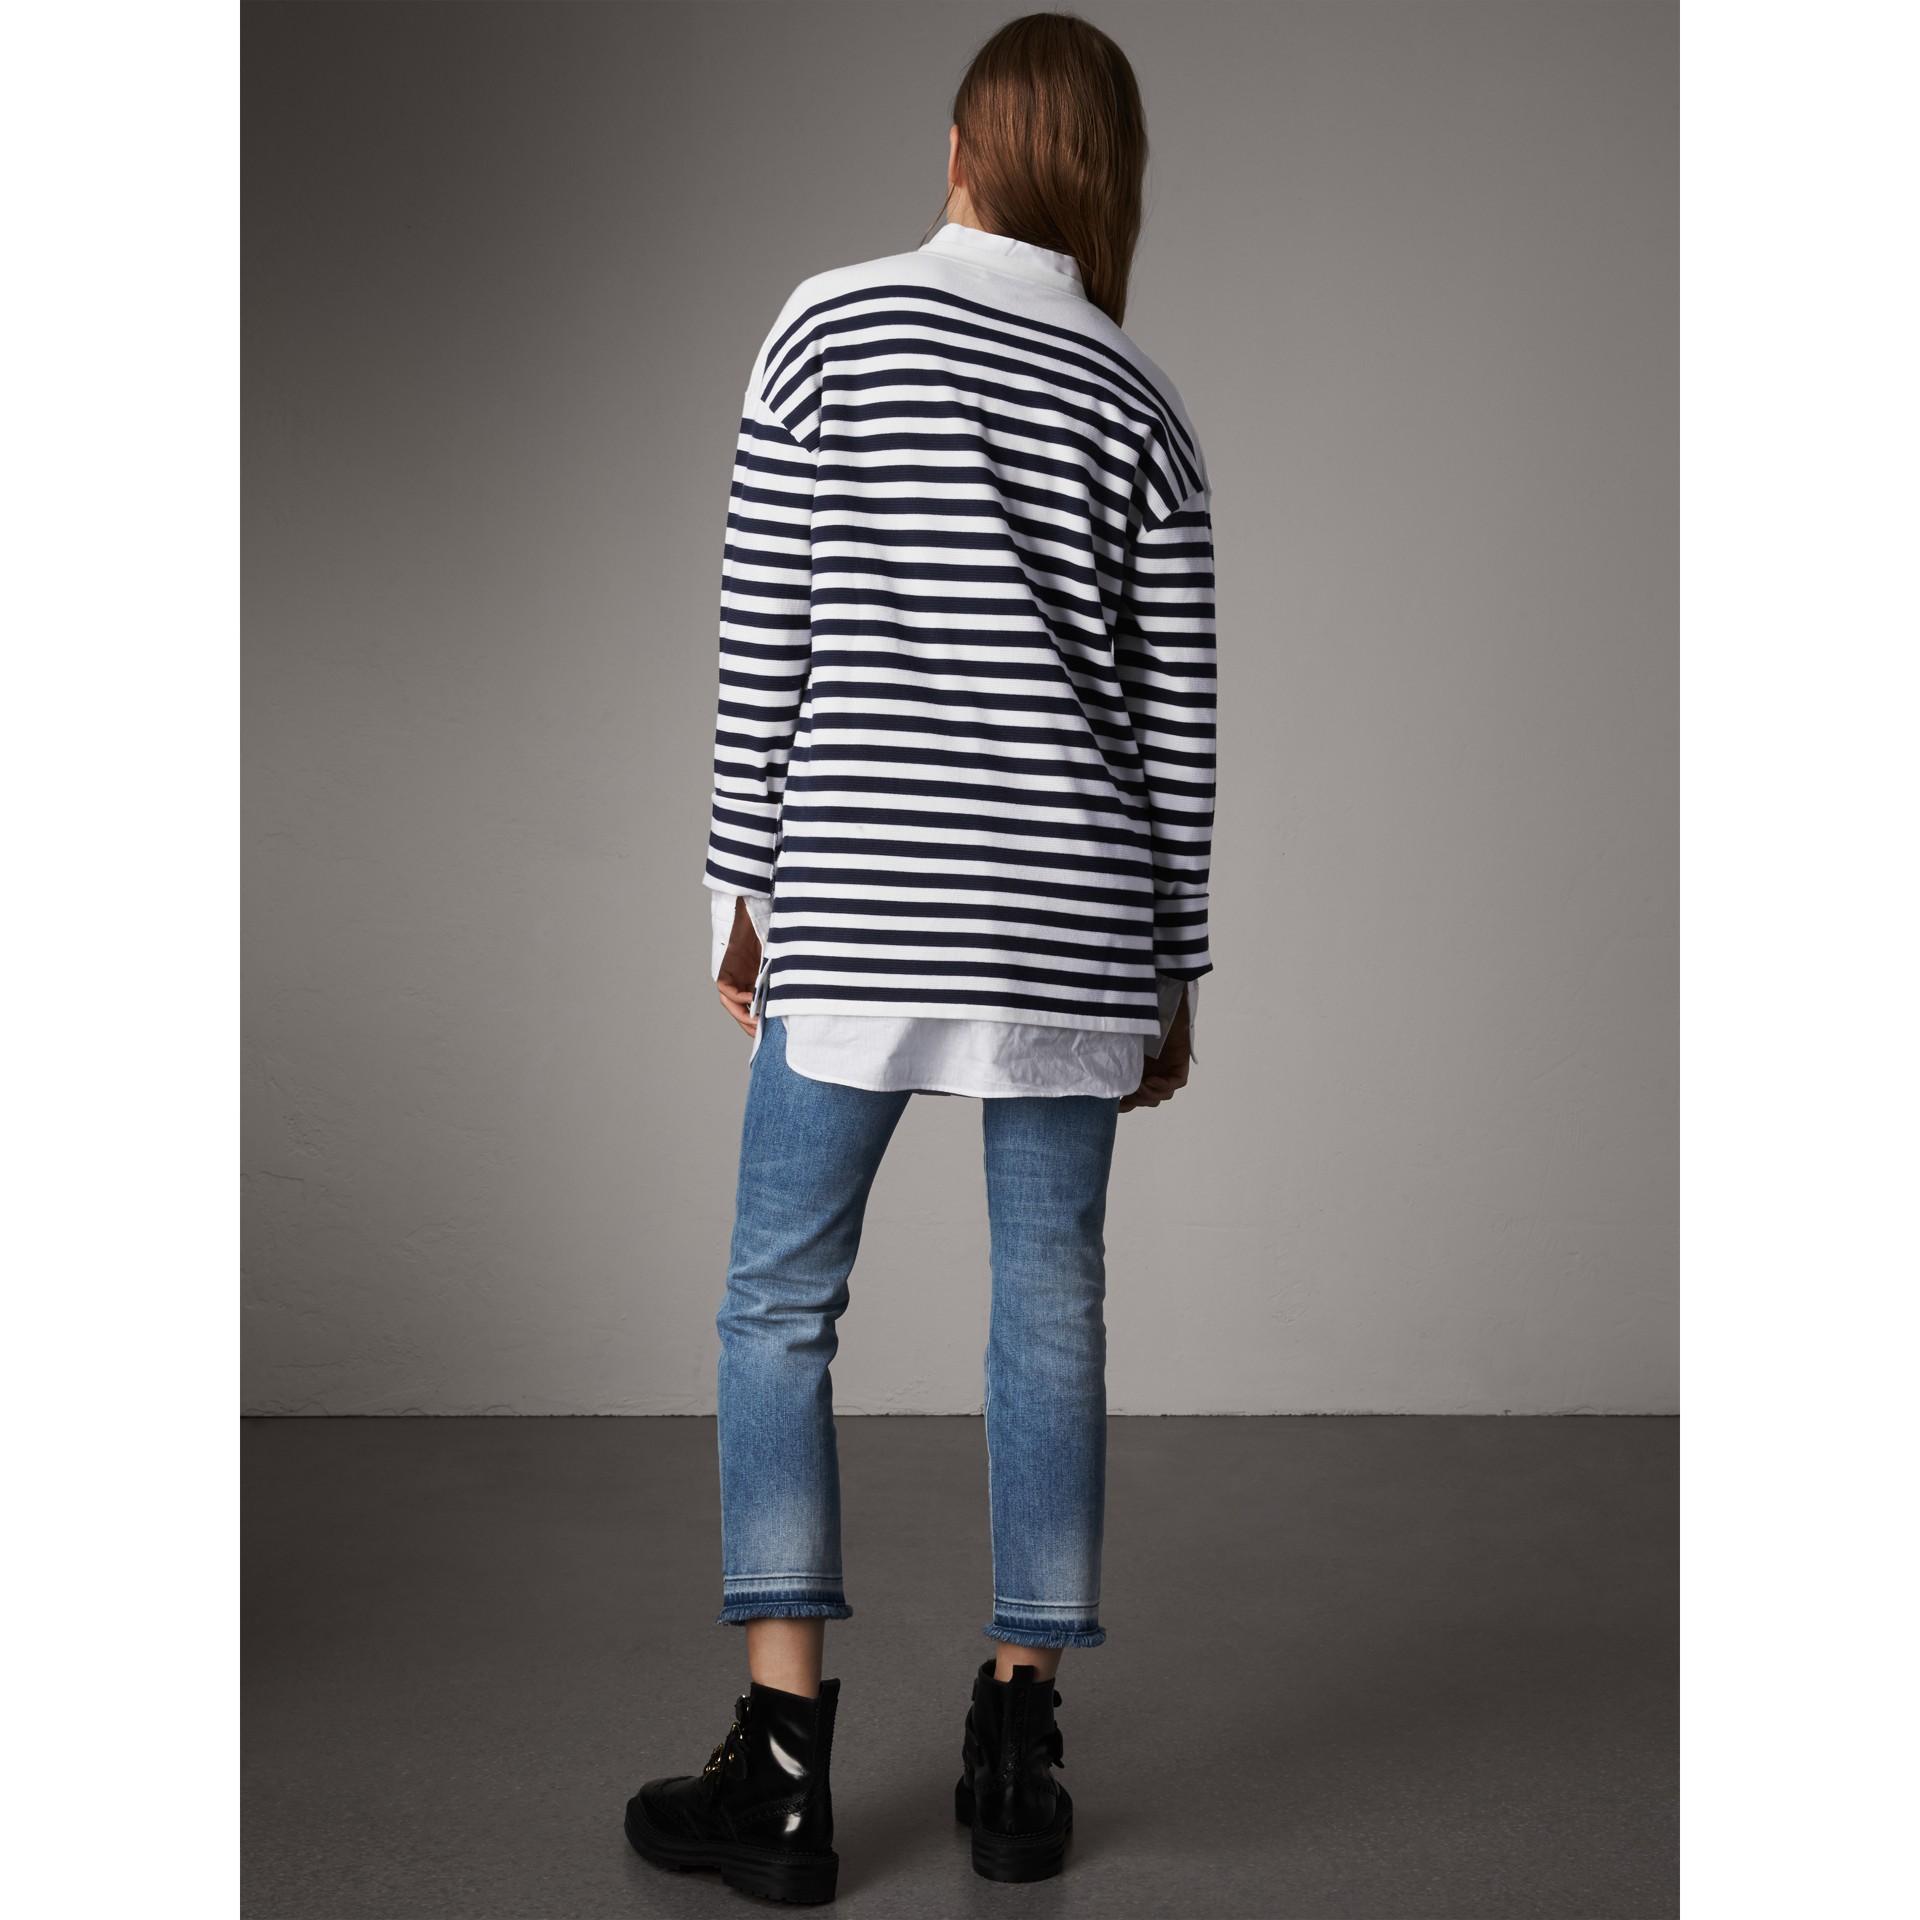 Breton Stripe Merino Wool Silk Blend Top in Navy - Women | Burberry - gallery image 2